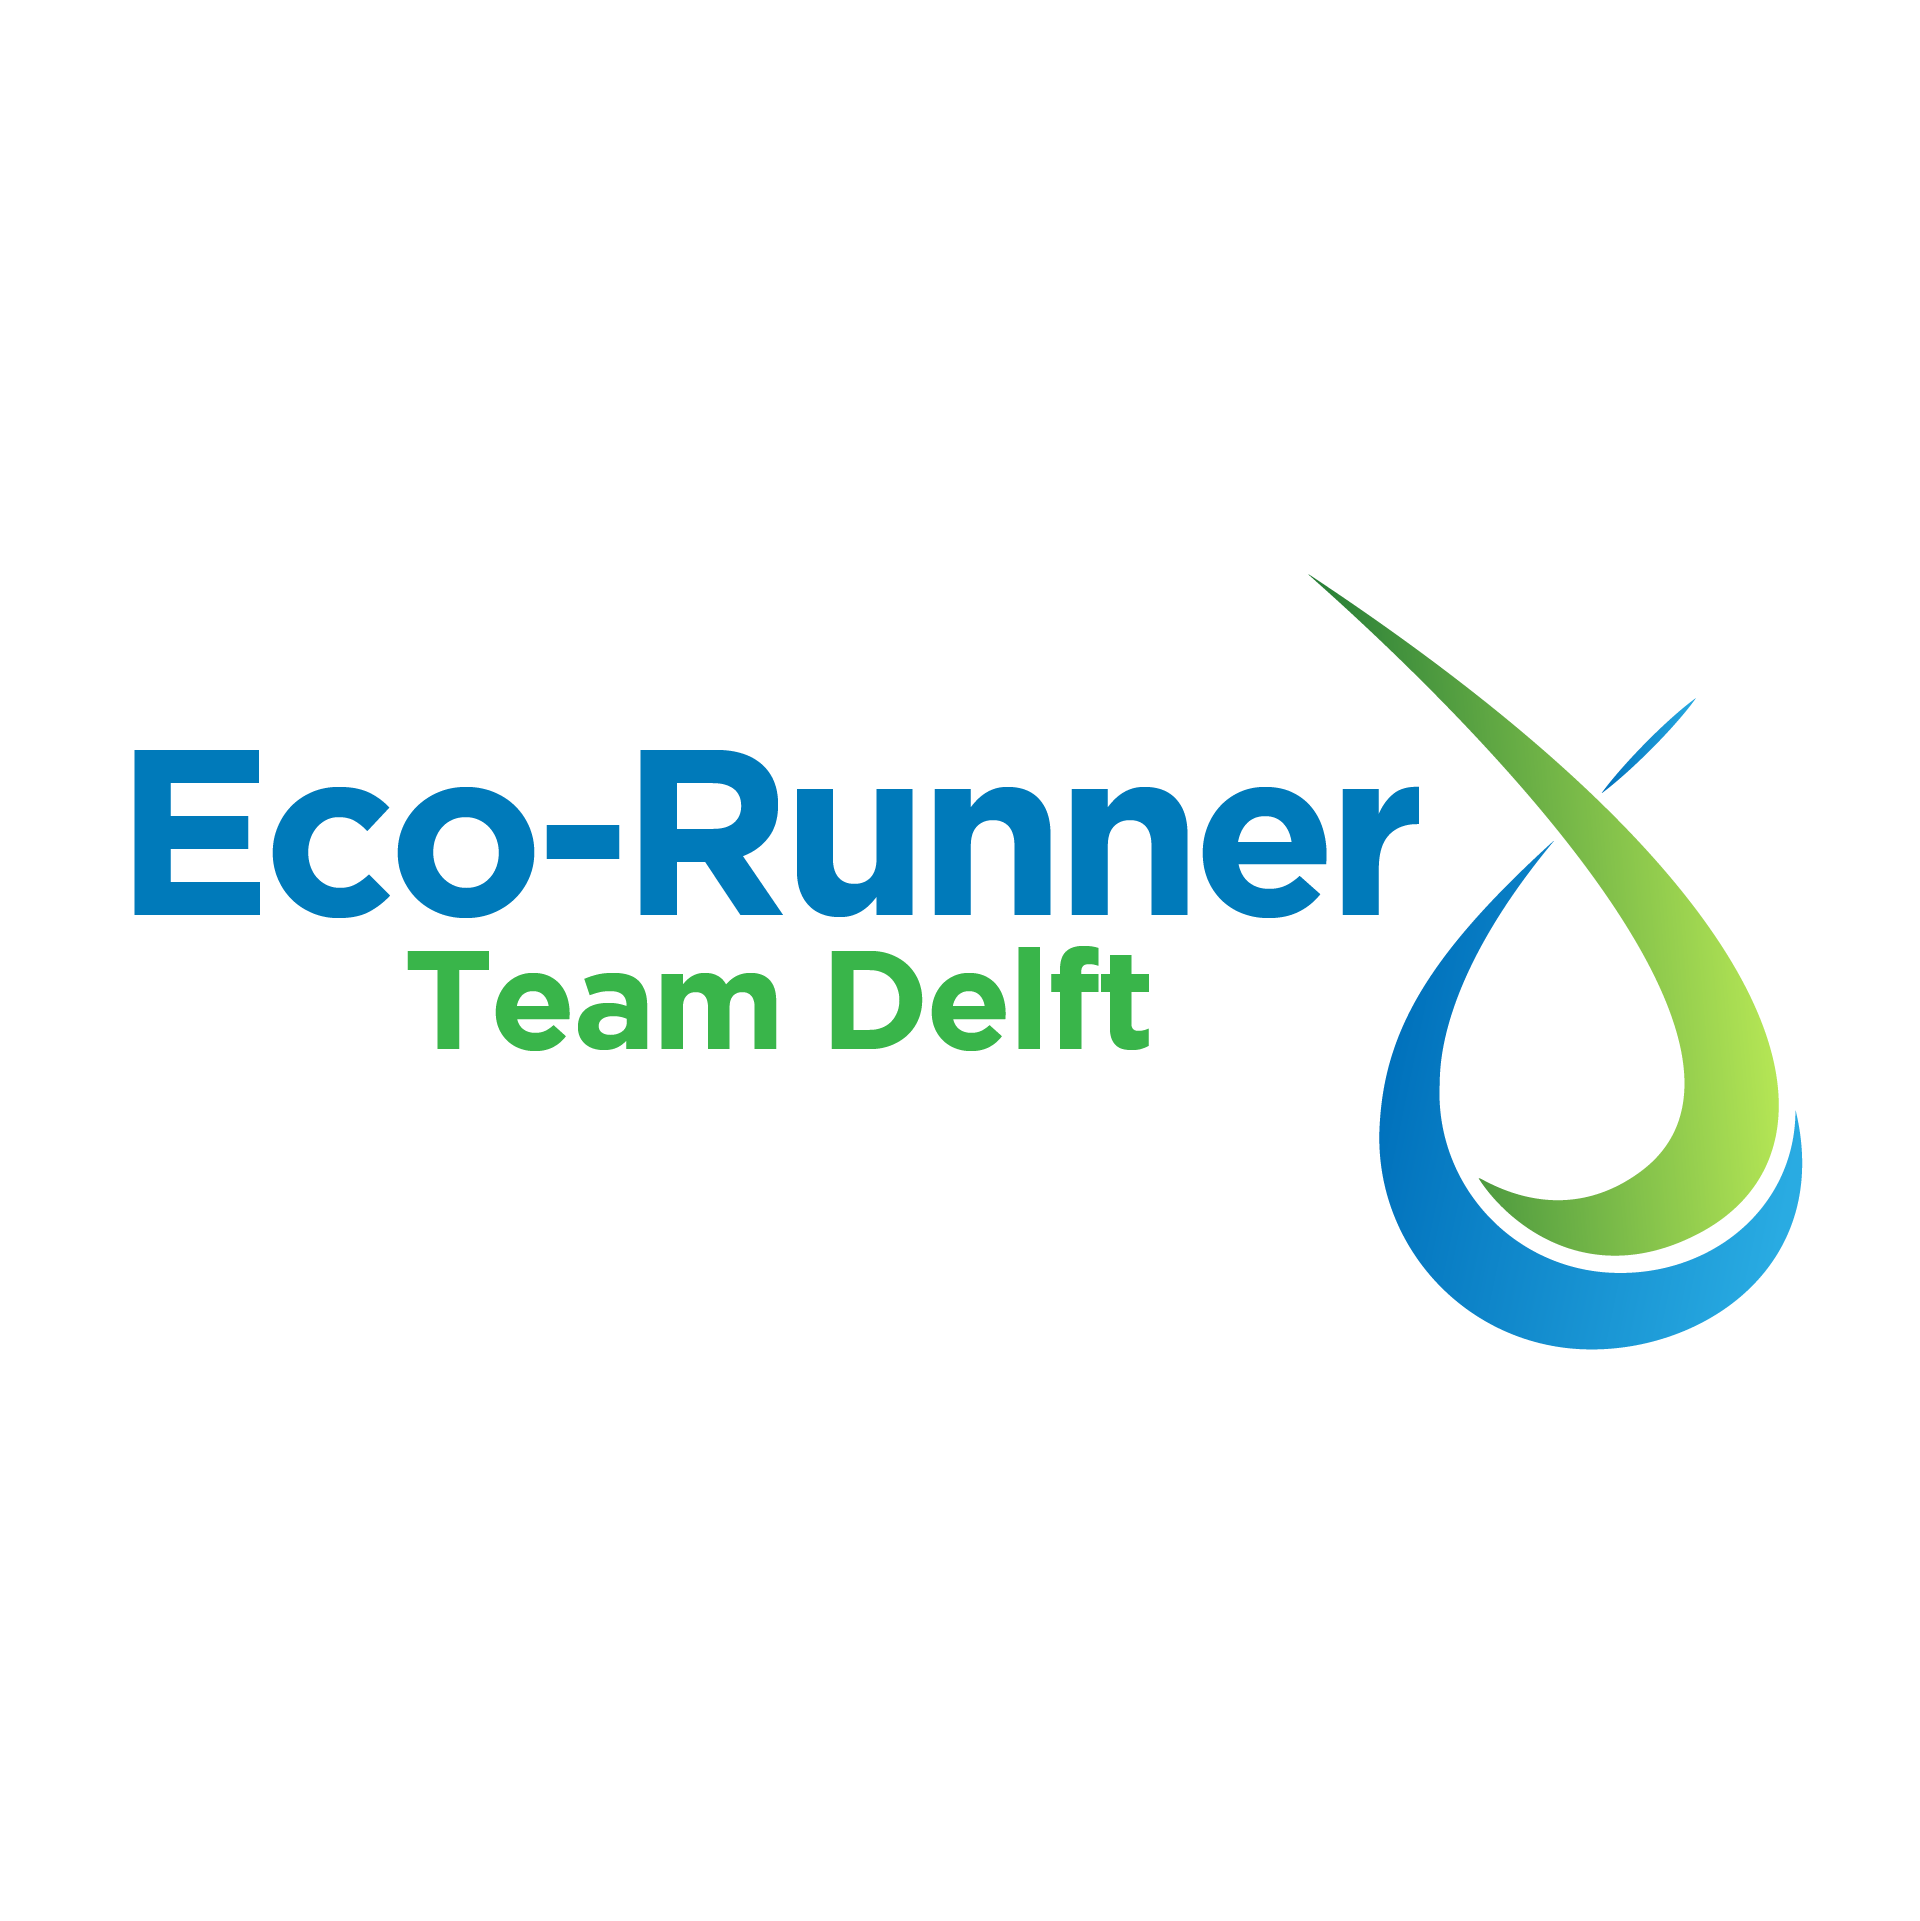 Ecorunner